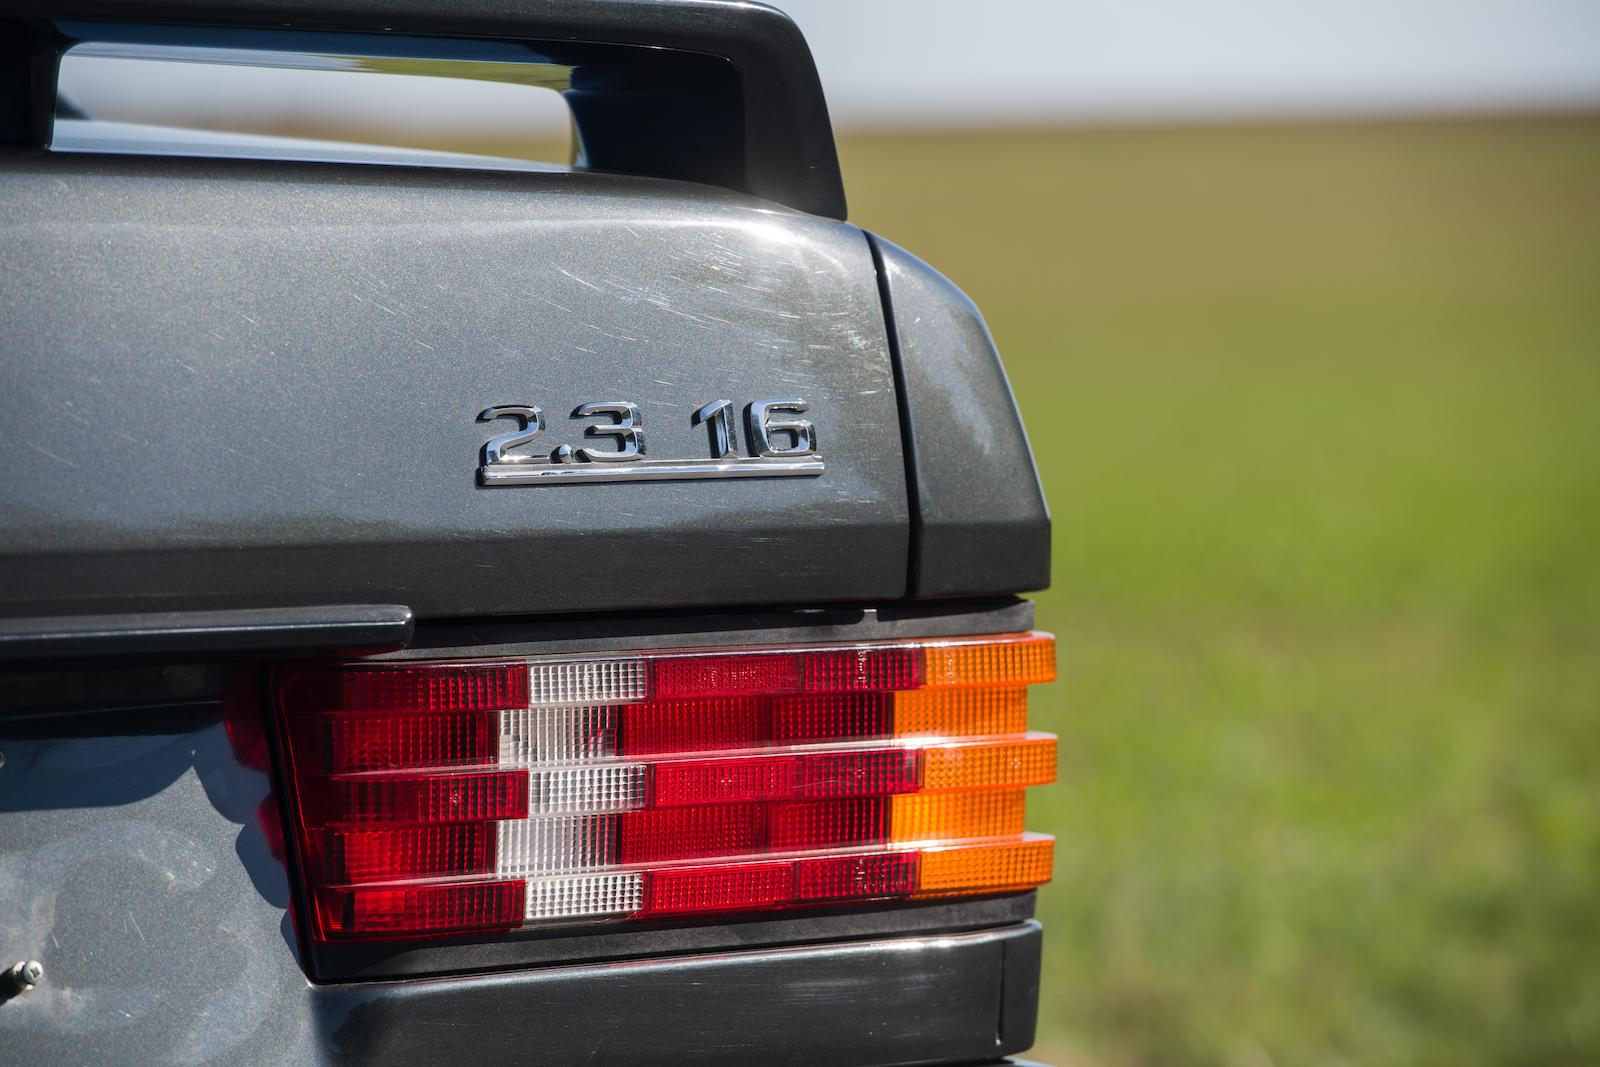 1985 Mercedes-Benz 190E 2.3-16 Sports Saloon badge